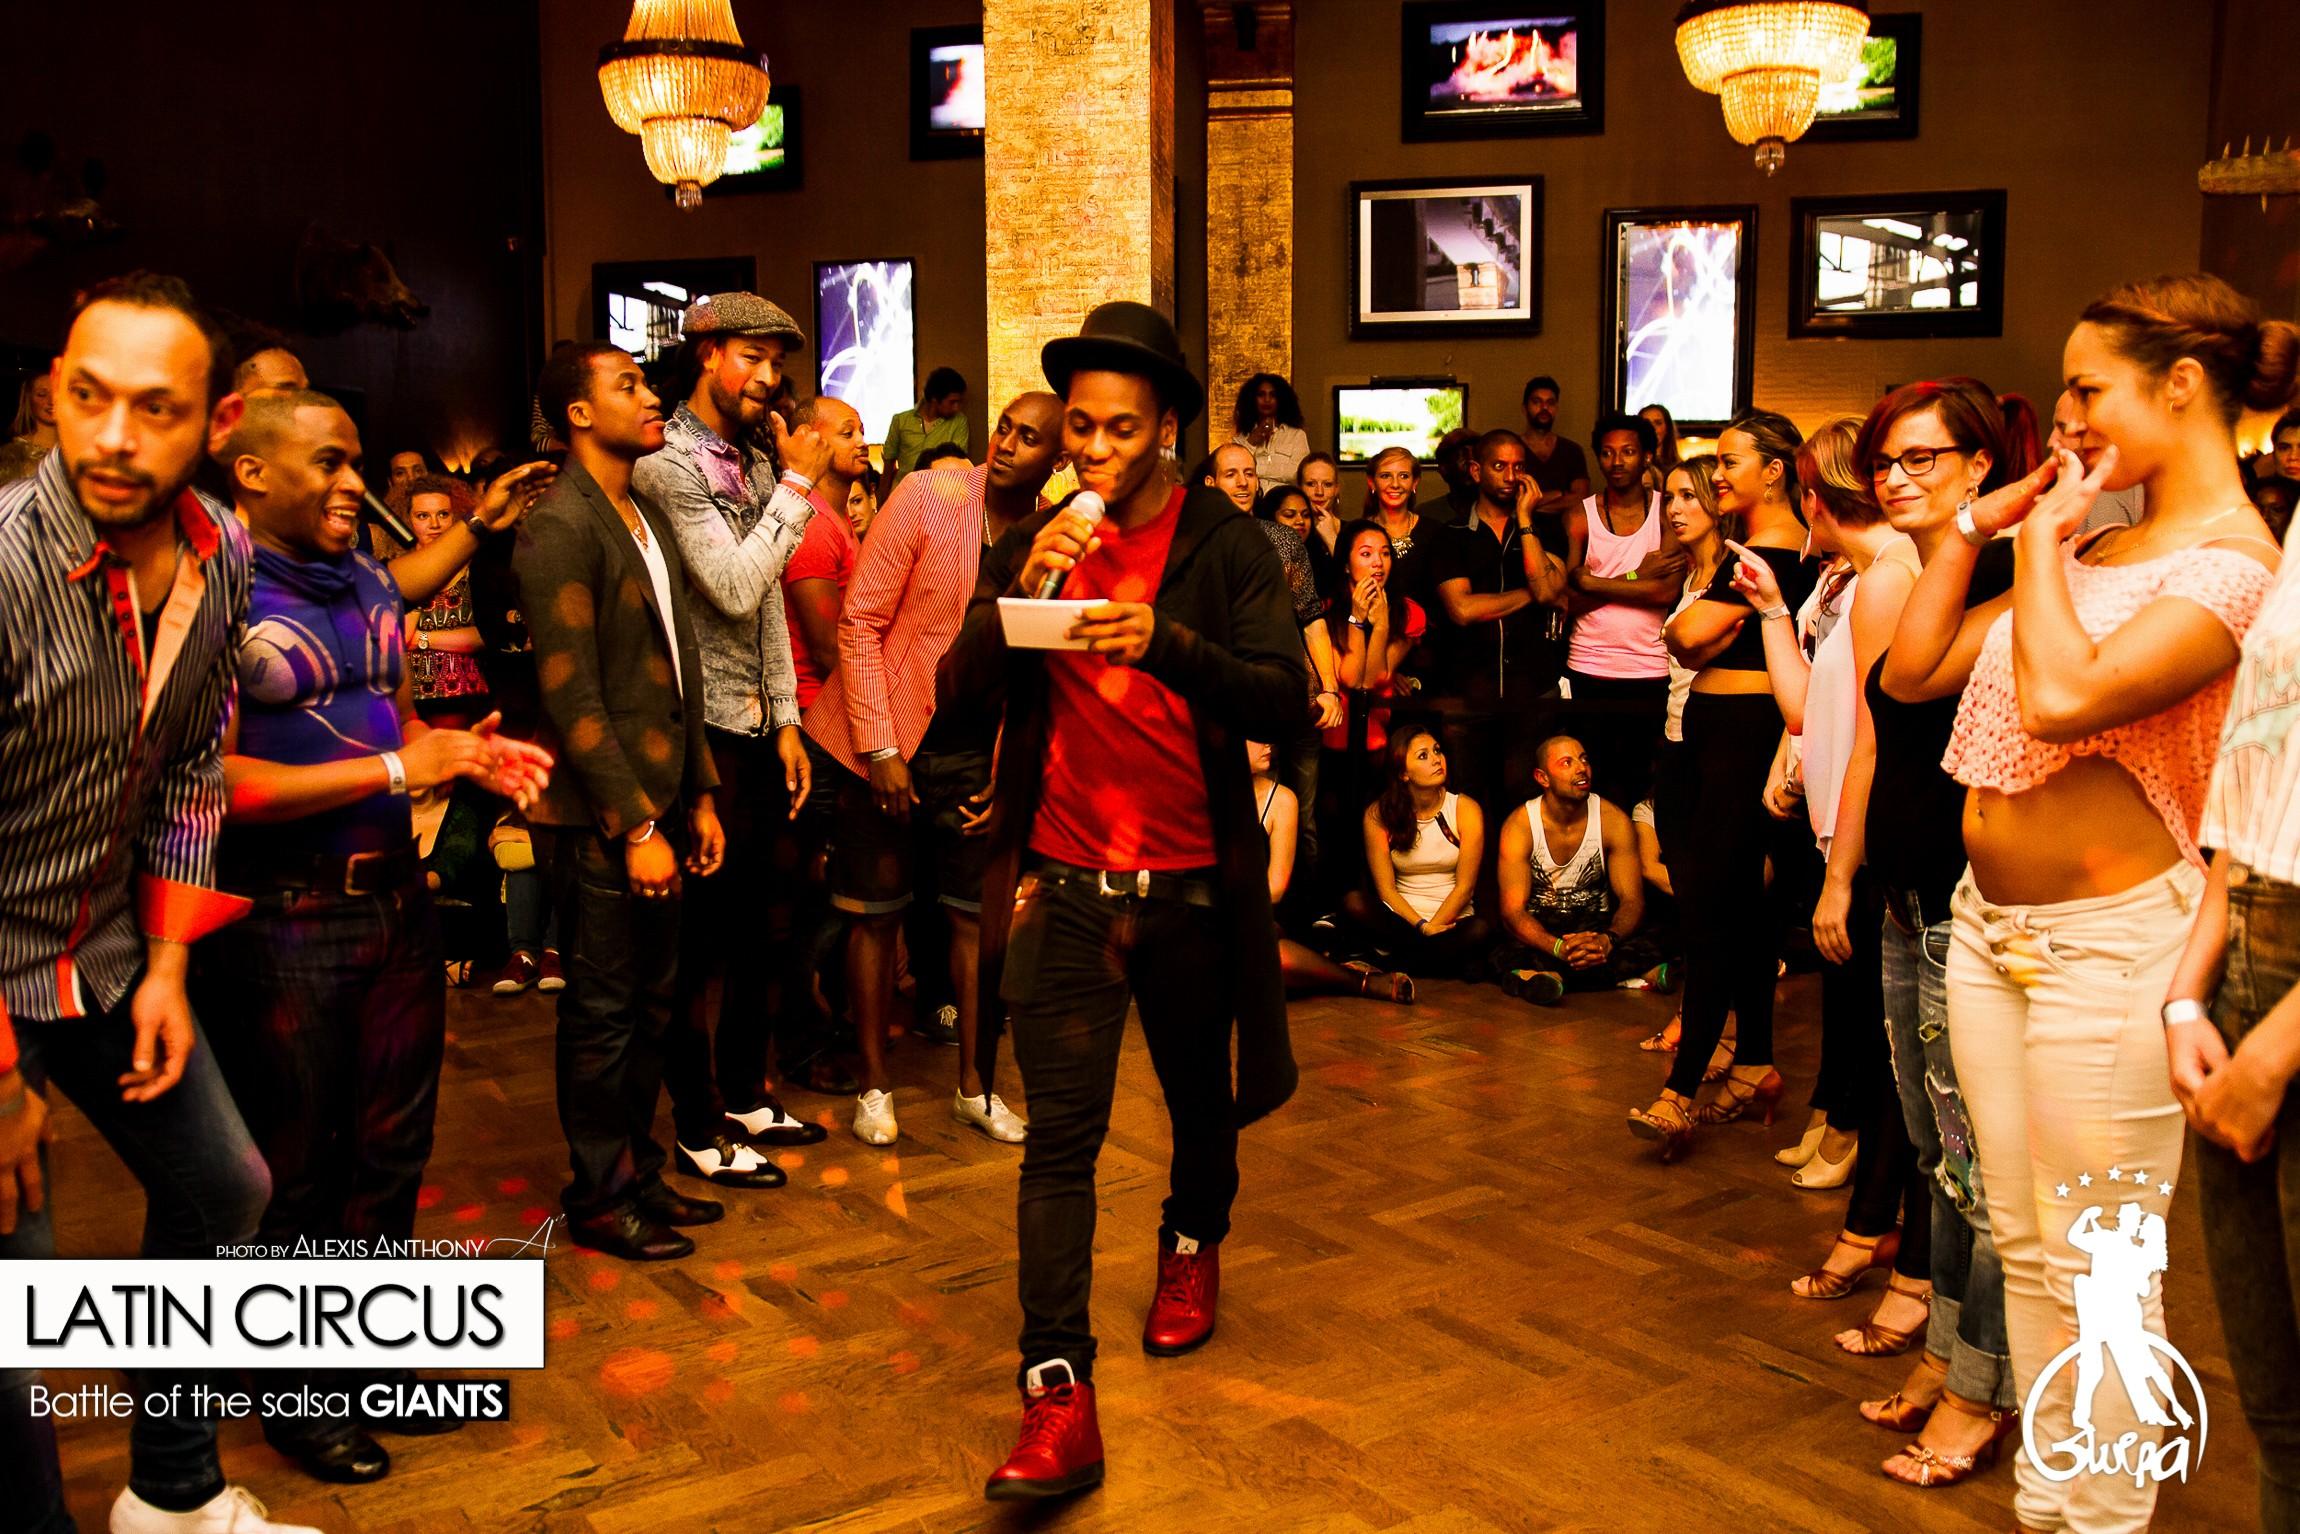 Latin Circus Battle of the Salsa Giants    11 Oct 2015